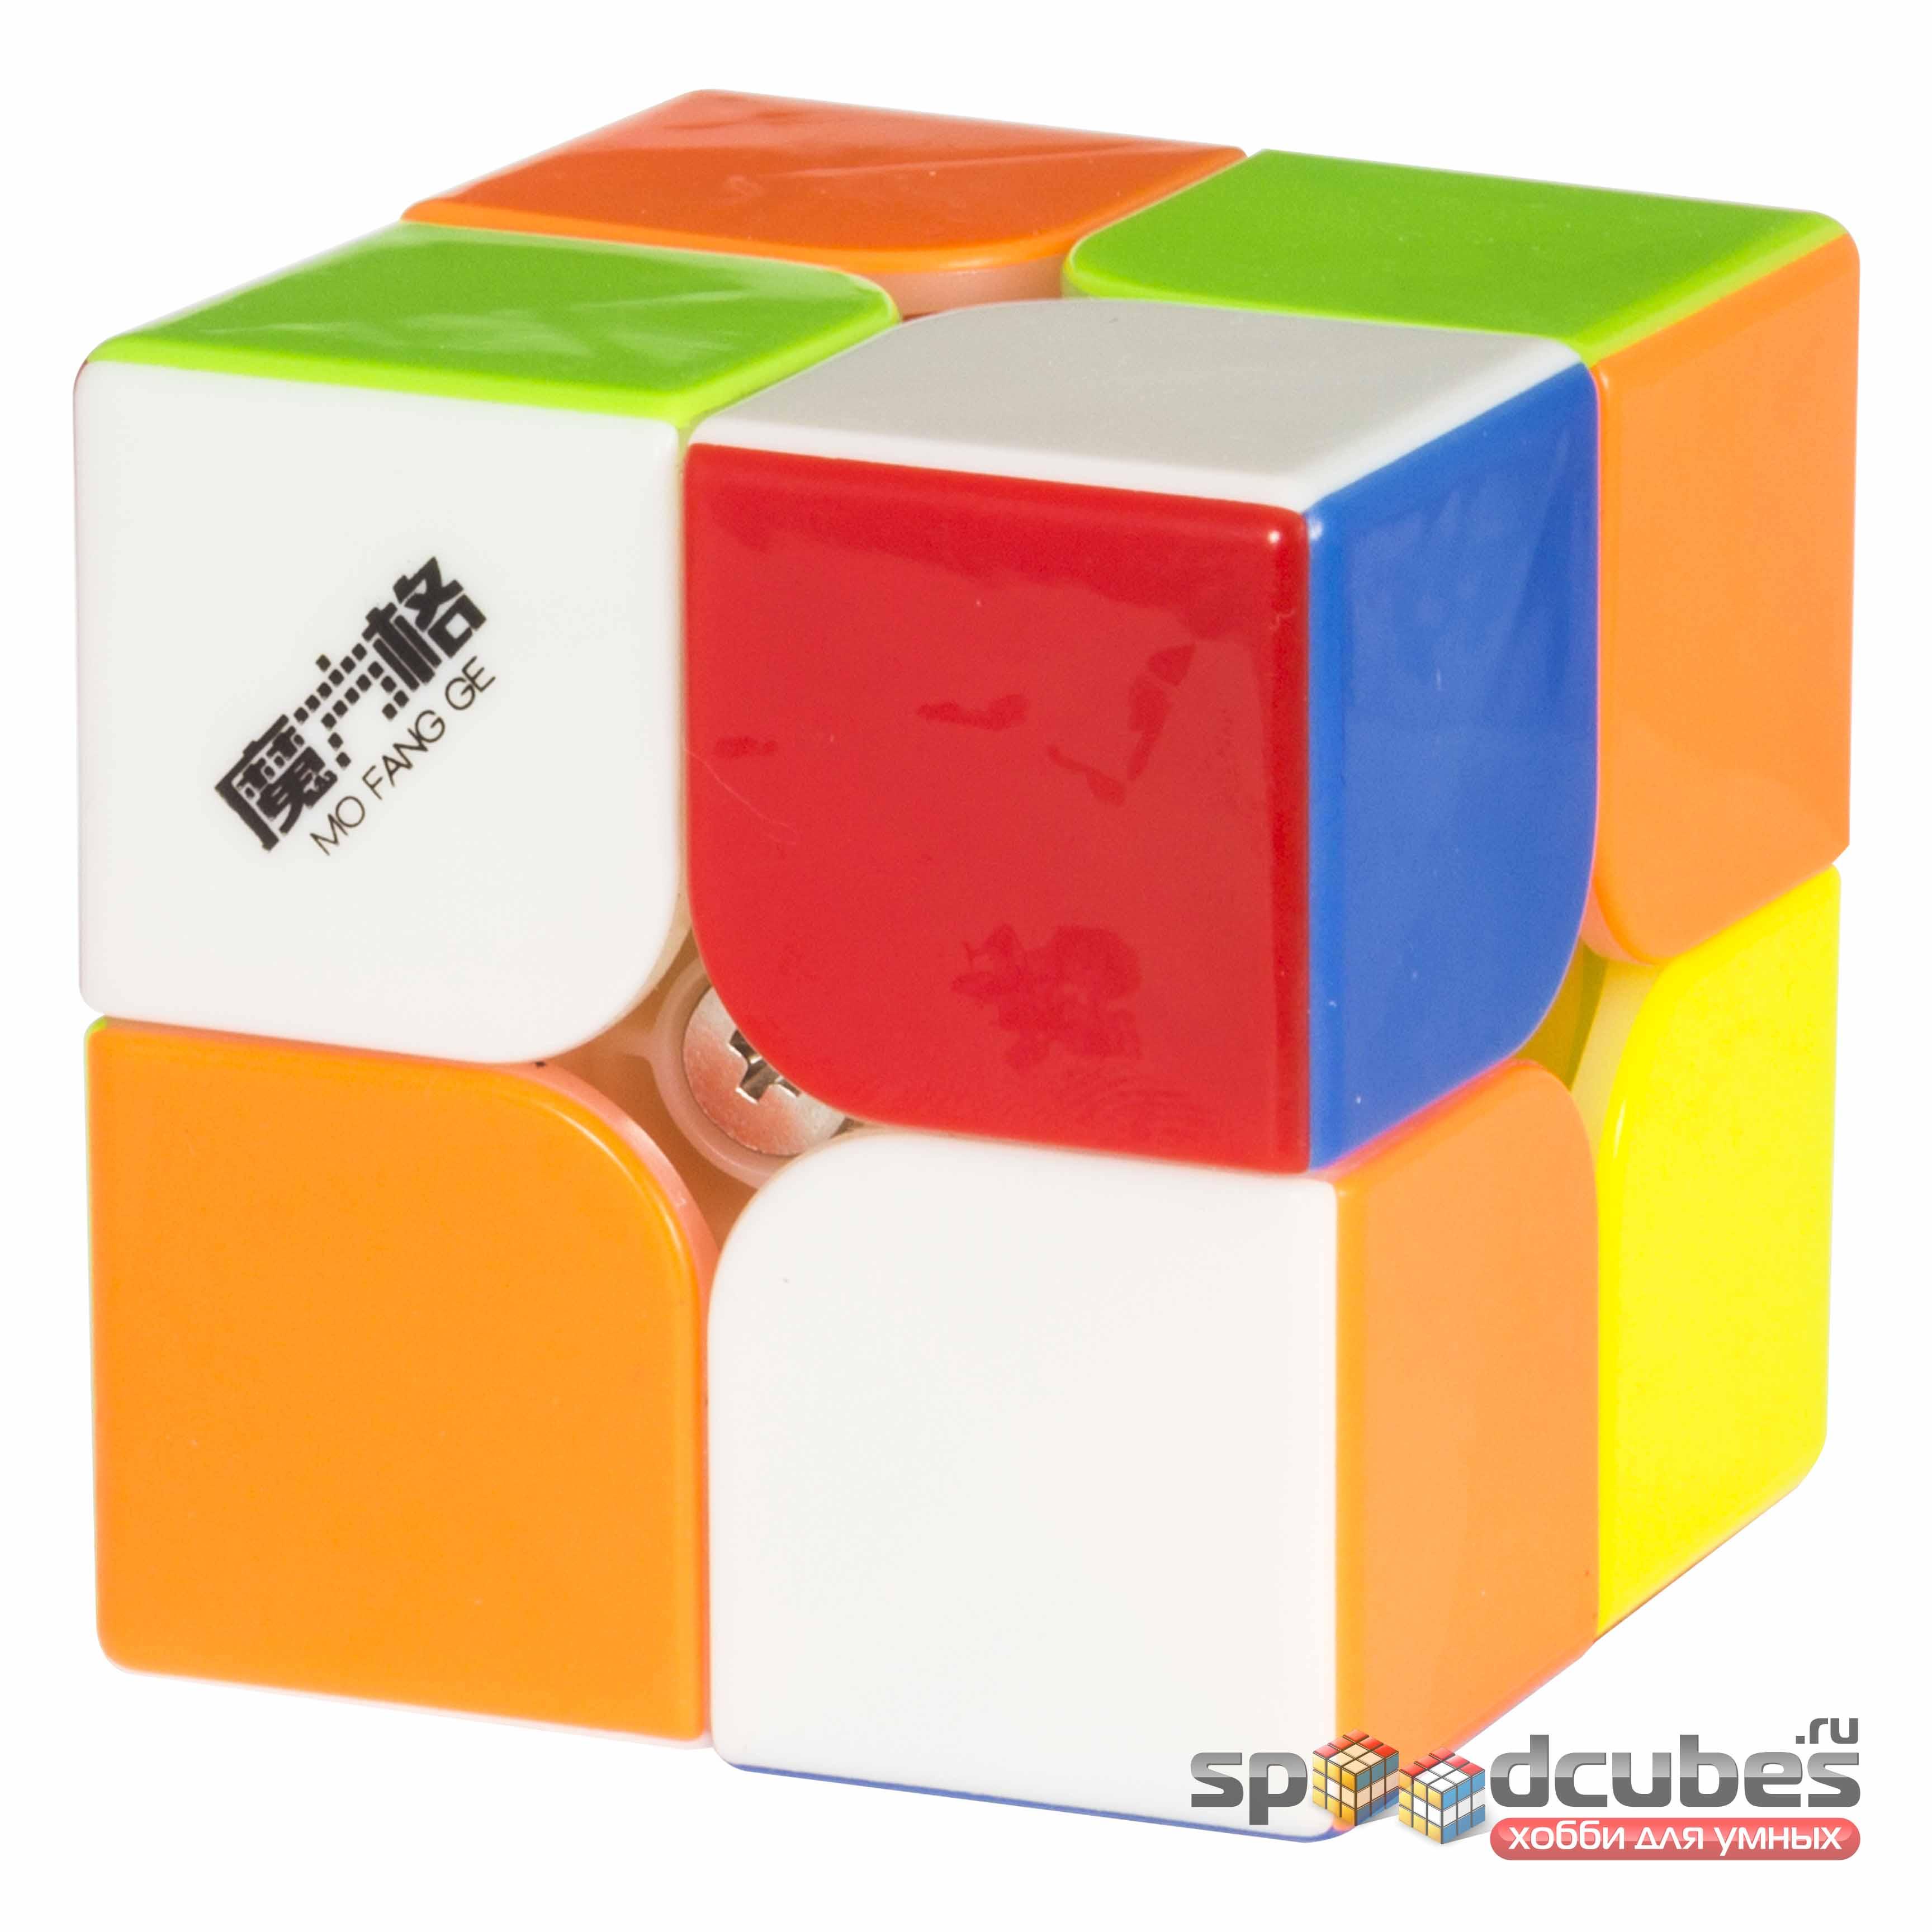 QiYi (MoFangGe) 2x2x2 WuXia Color 3